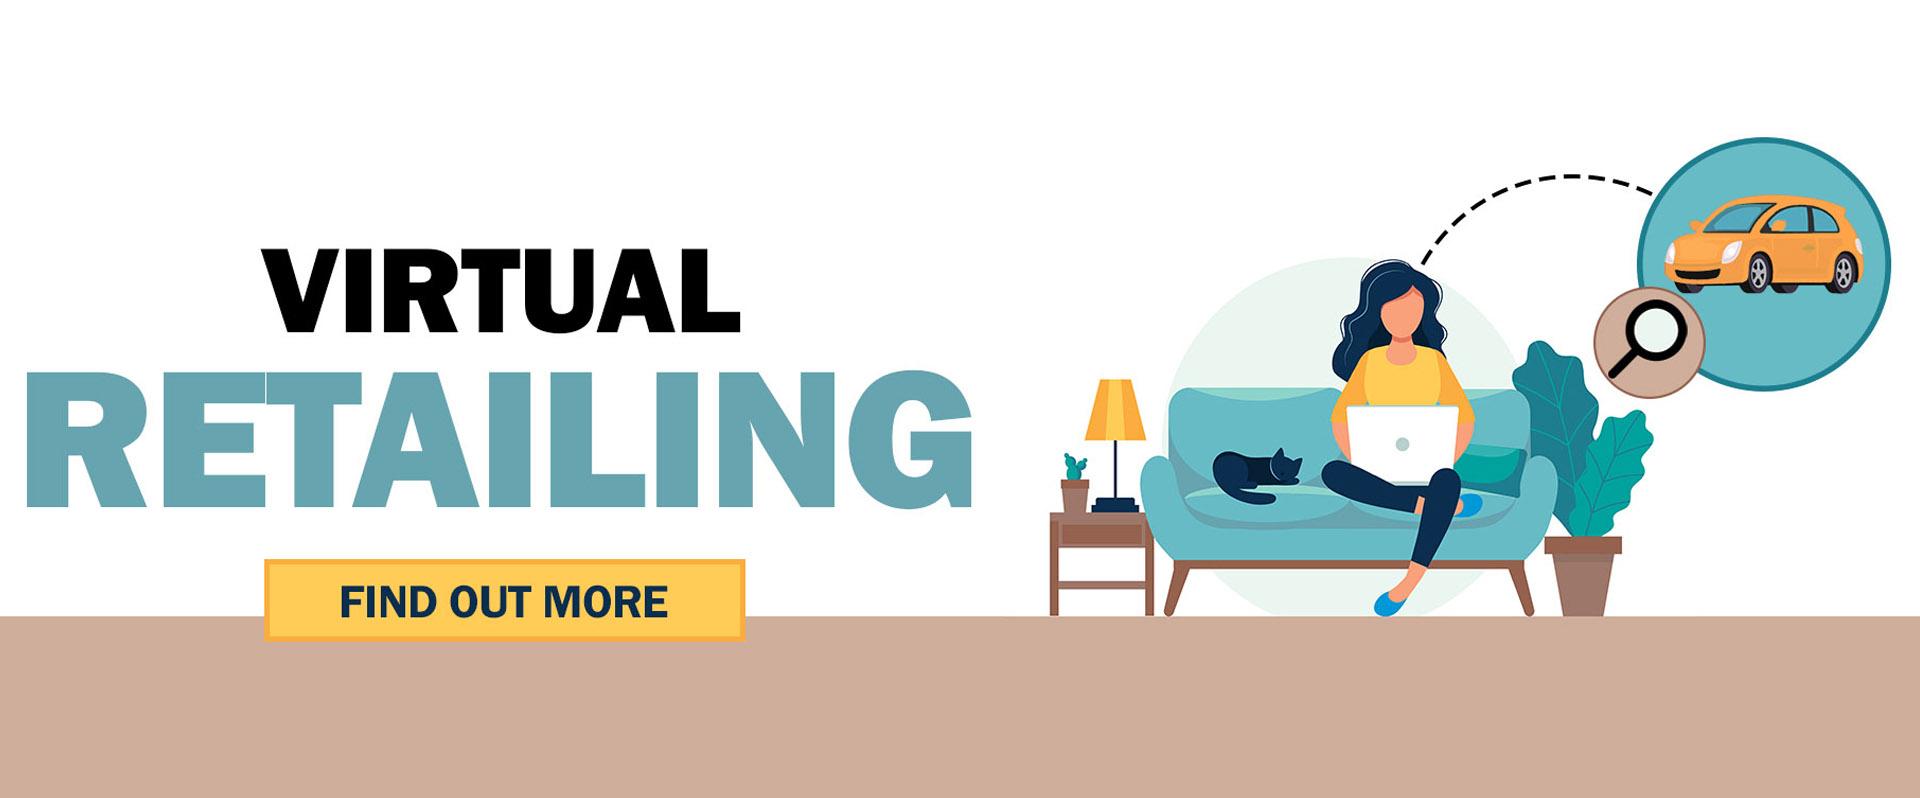 Southern VW Virtual Retailing